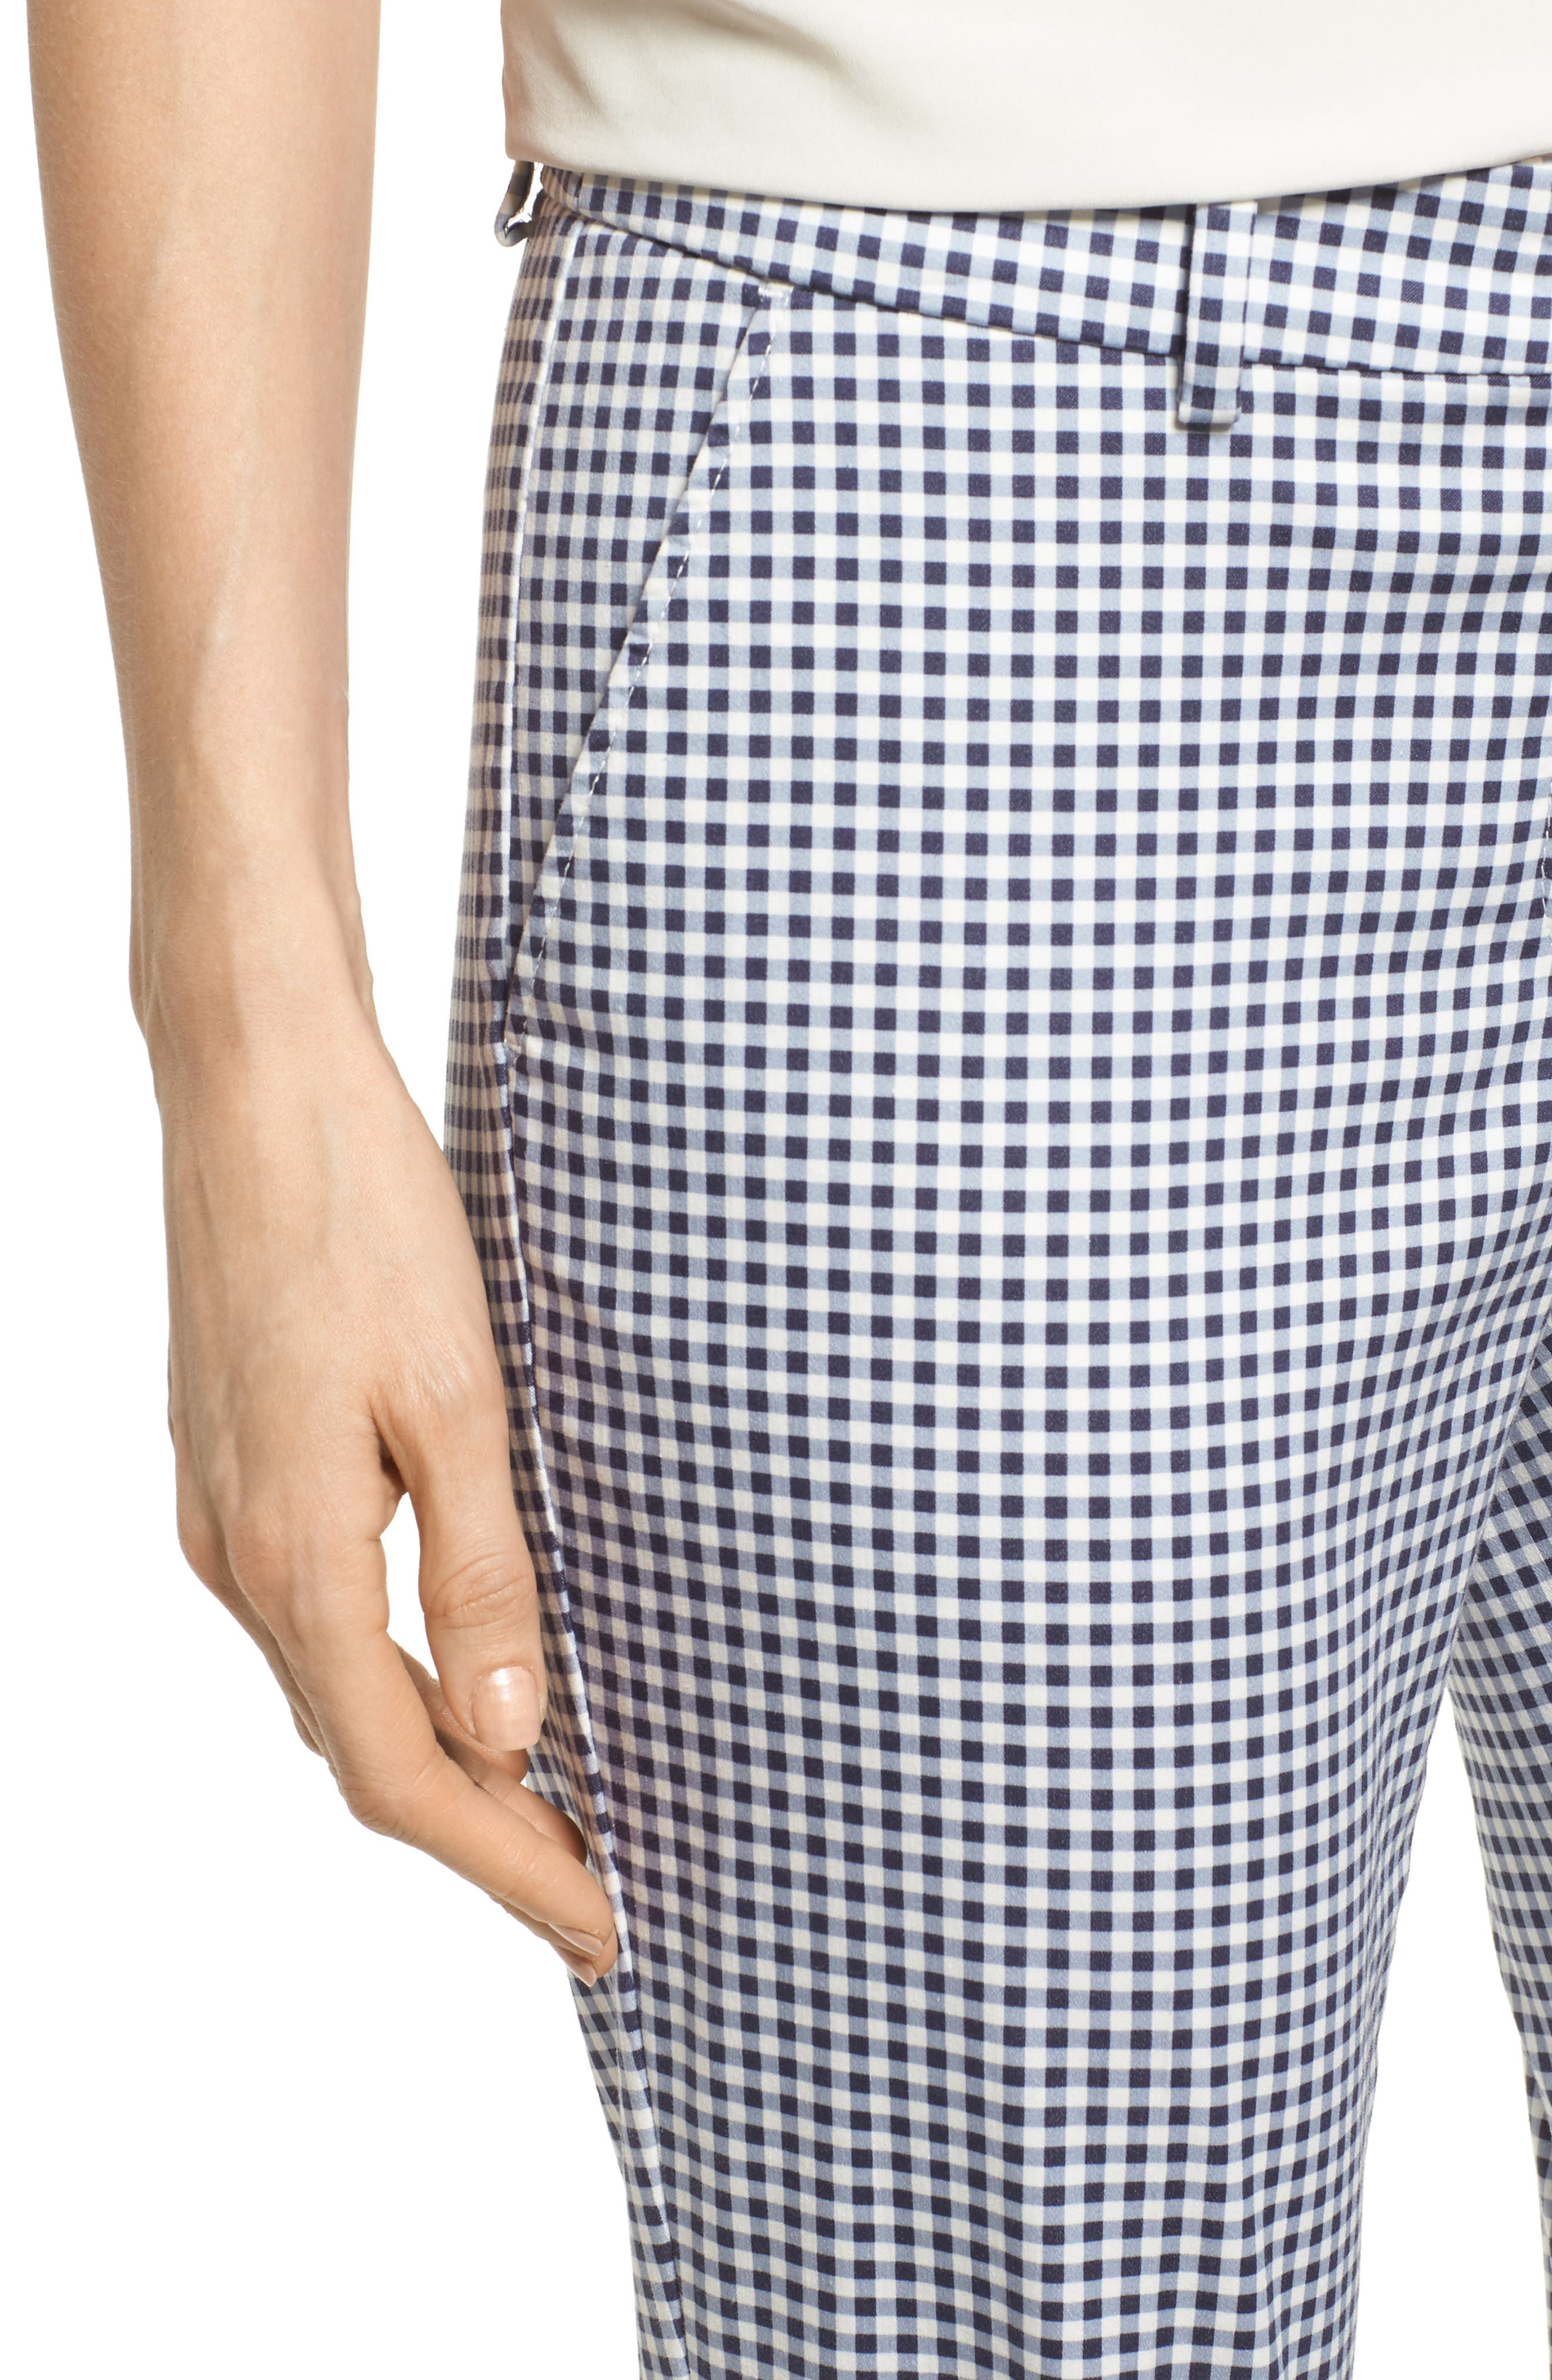 Maron Gingham Stretch Cotton Pants,                             Alternate thumbnail 4, color,                             OCEAN